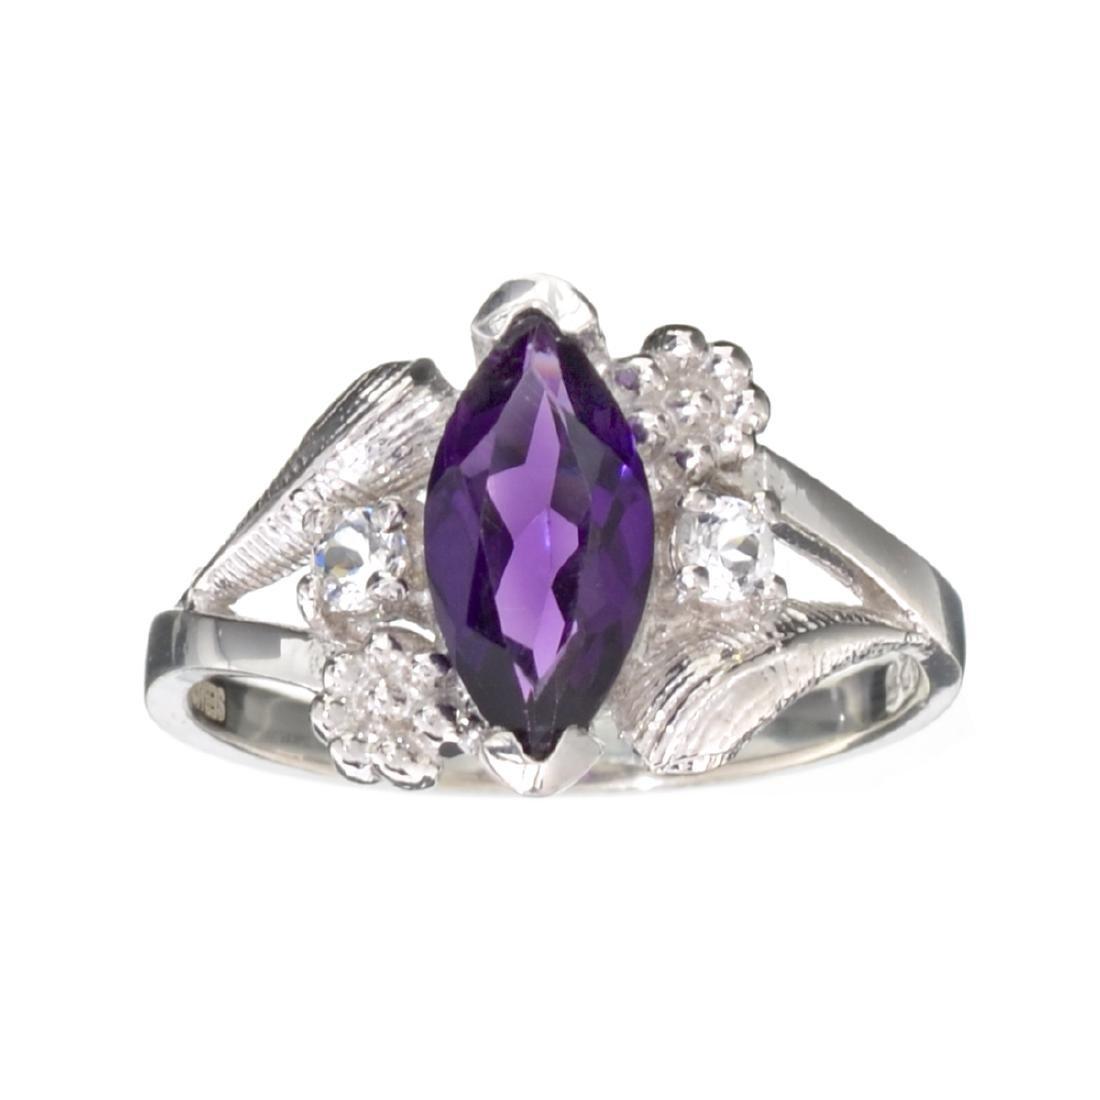 APP: 0.5k Fine Jewelry Designer Sebastian, 1.60CT